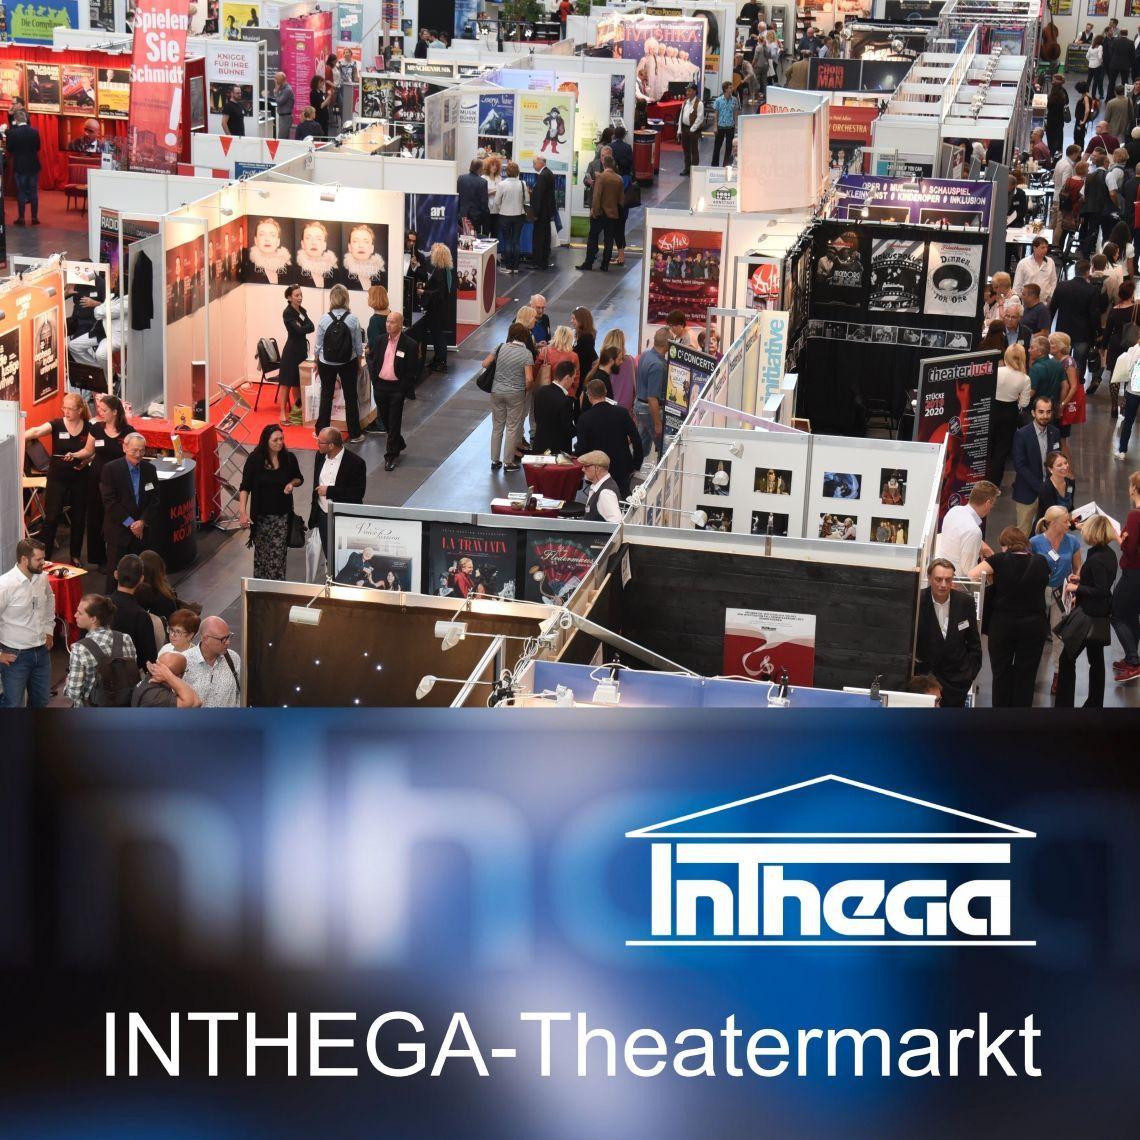 INTHEGA-Theatermarkt 2021 - noch 6 Tage